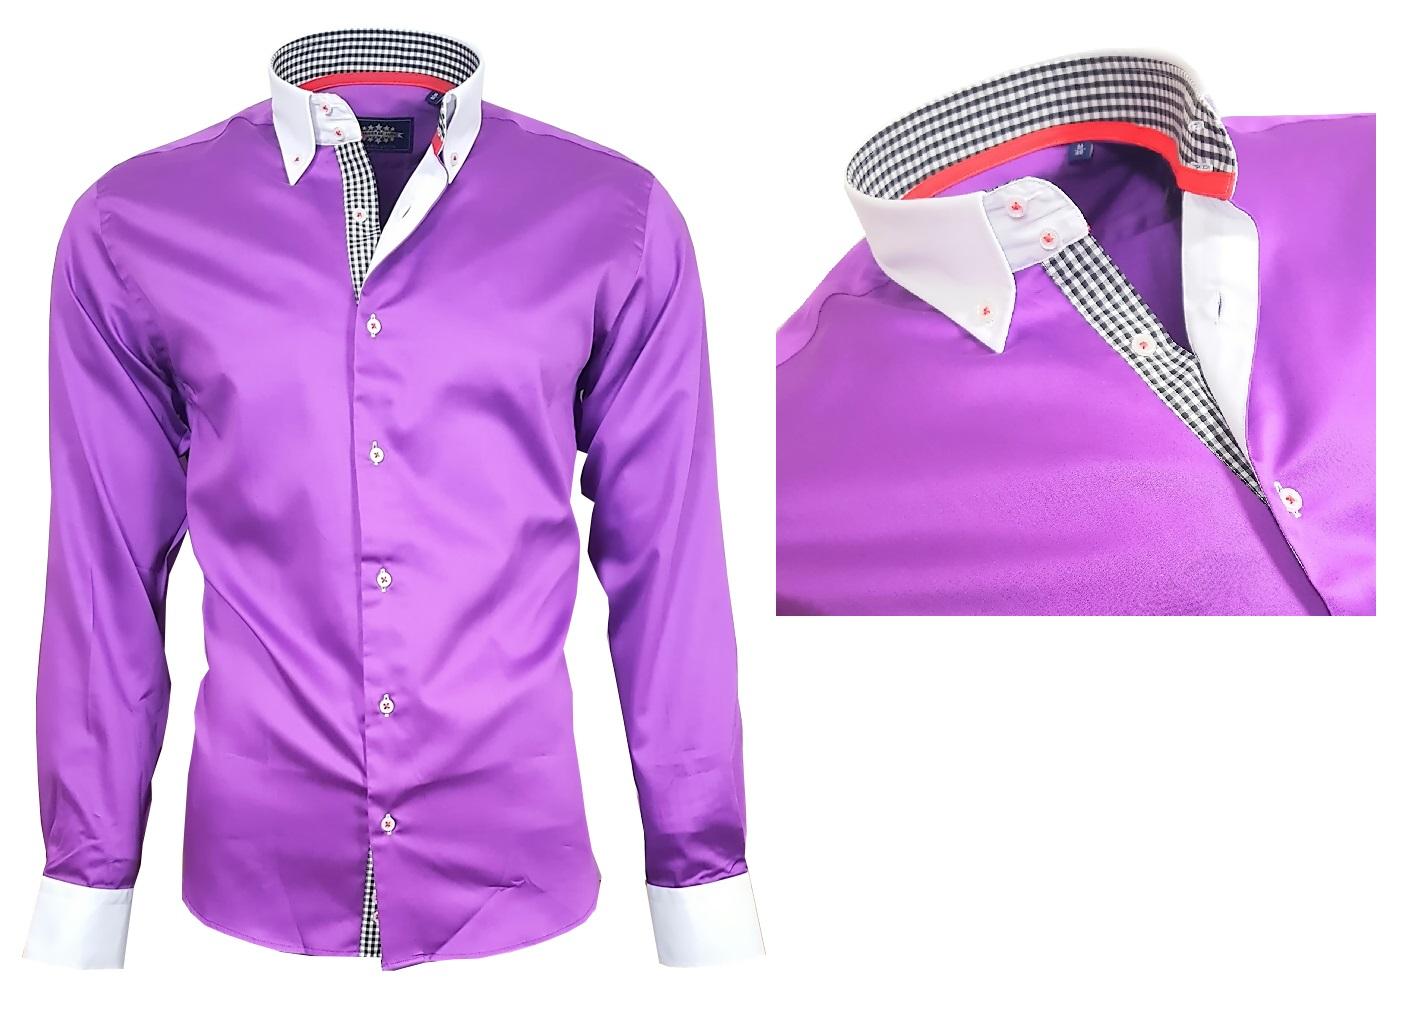 Herrenhemd Herren Hemd Satin Baumwolle Binder de Luxe 80807 Lila M ... e1af0a8cc1